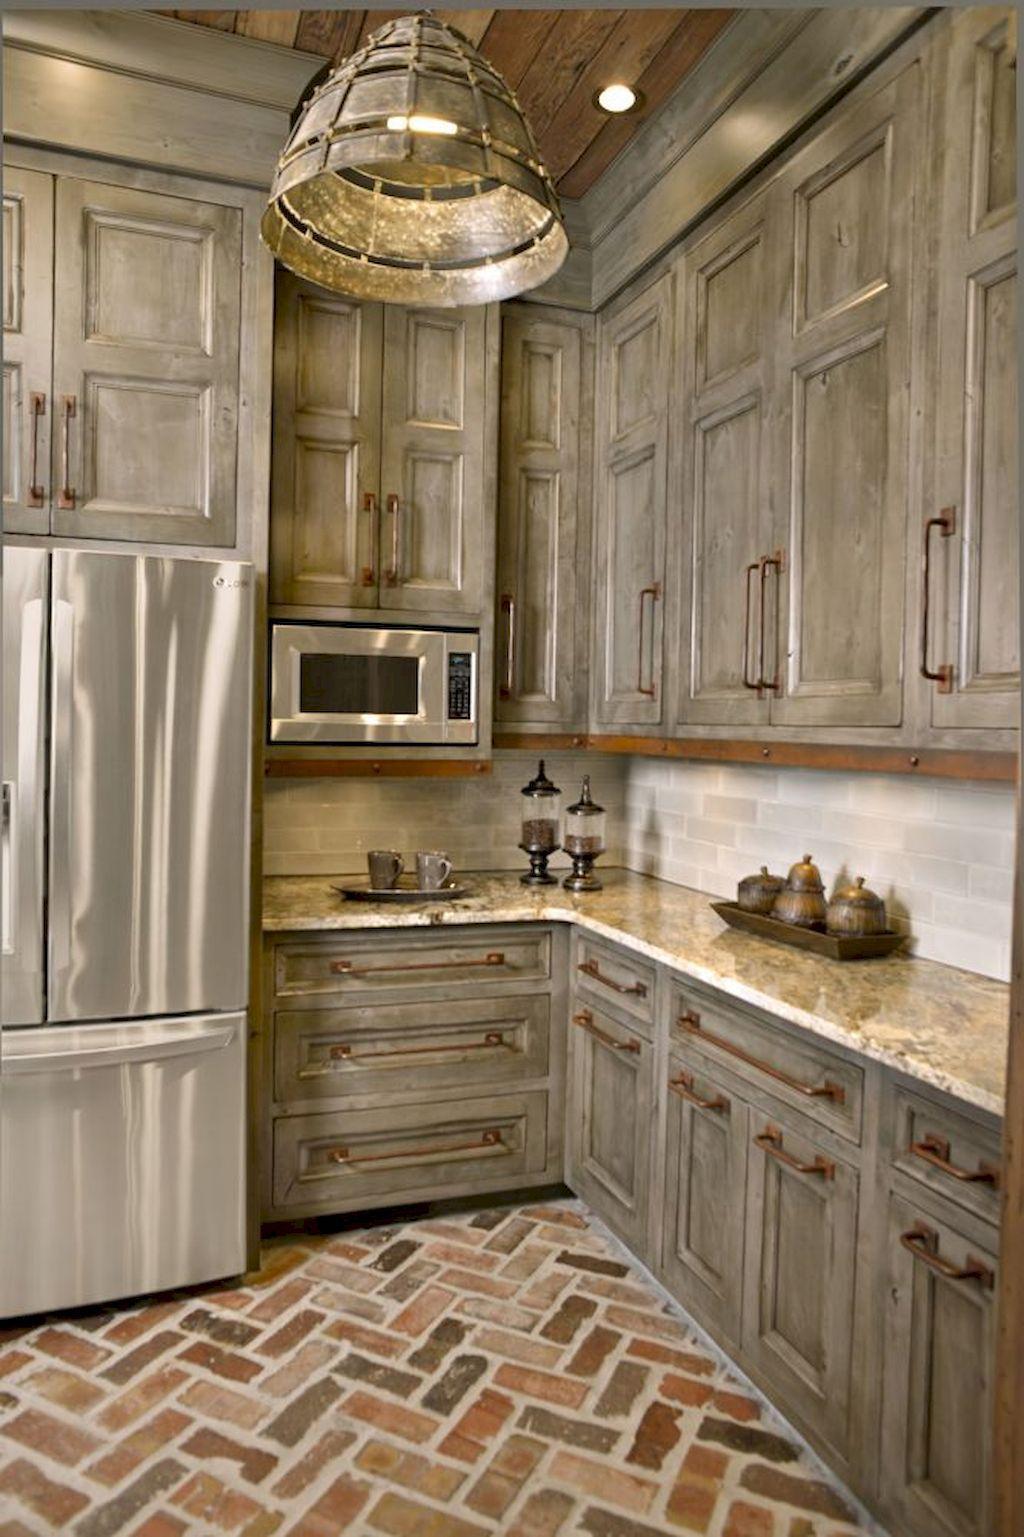 90 Rustic Kitchen Cabinets Farmhouse Style Ideas Rustic Kitchen Cabinets Brick Floor Kitchen Kitchen Cabinet Design